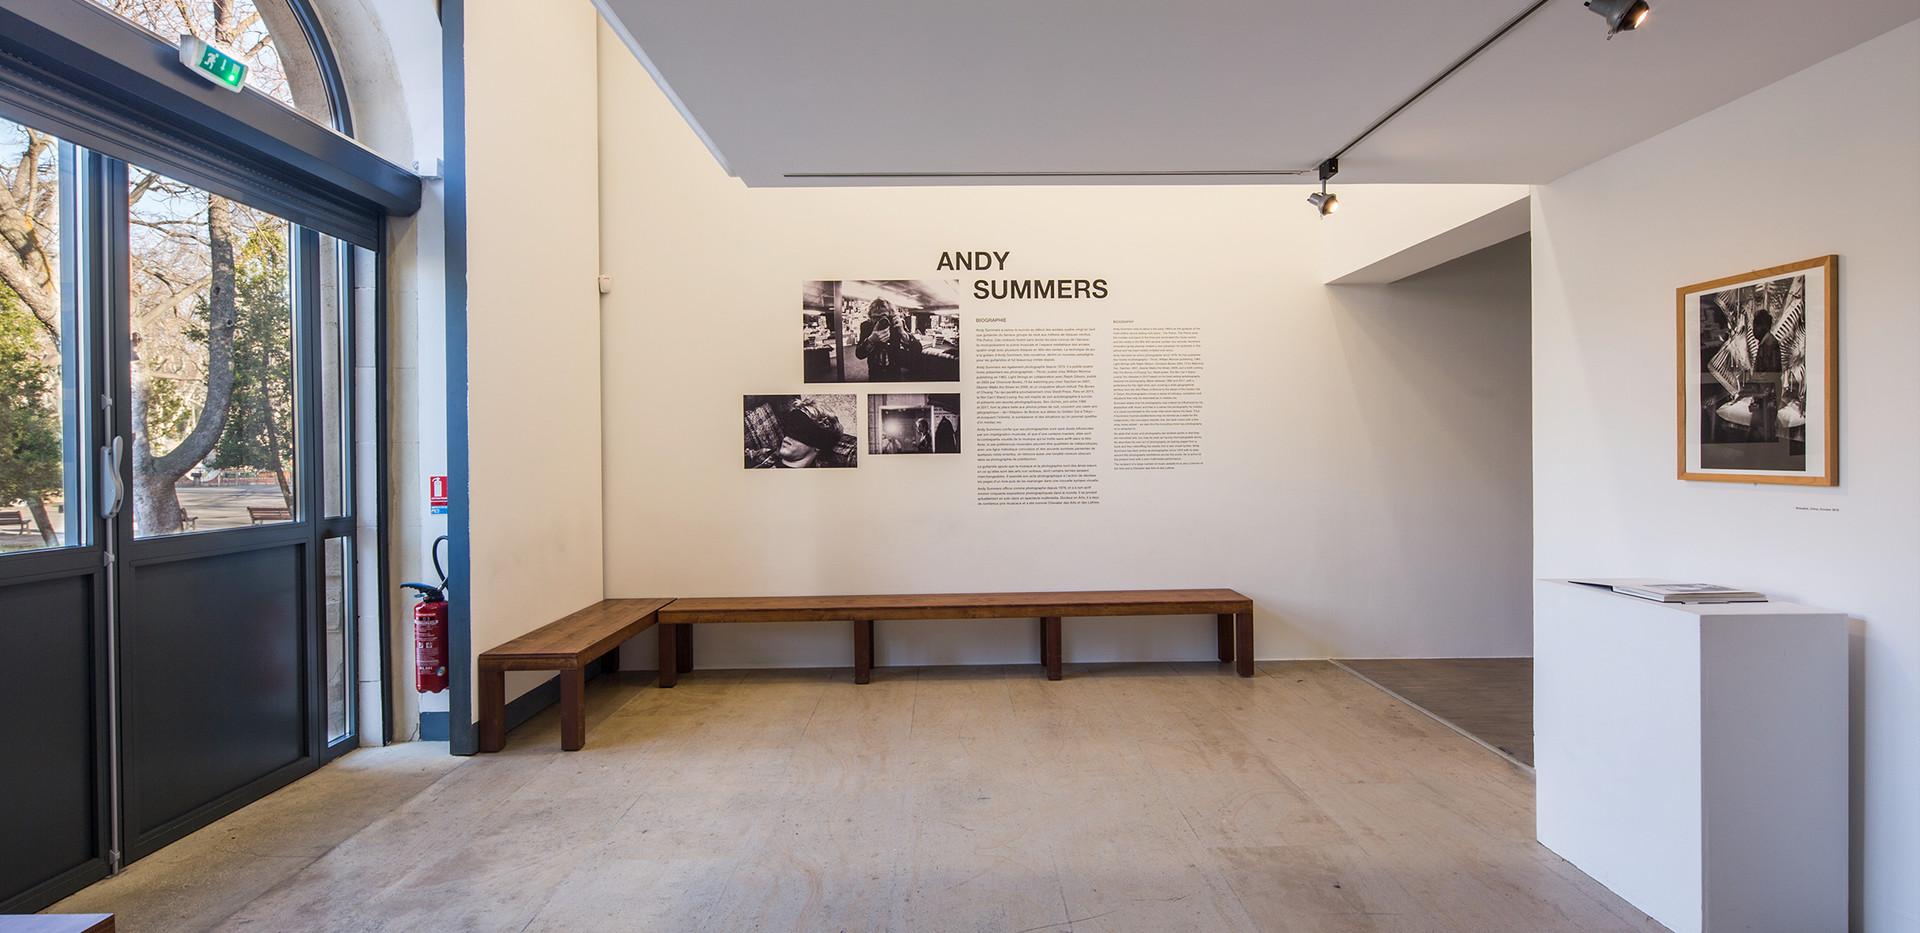 ANDYSUMMERS_Pavillon Populaire